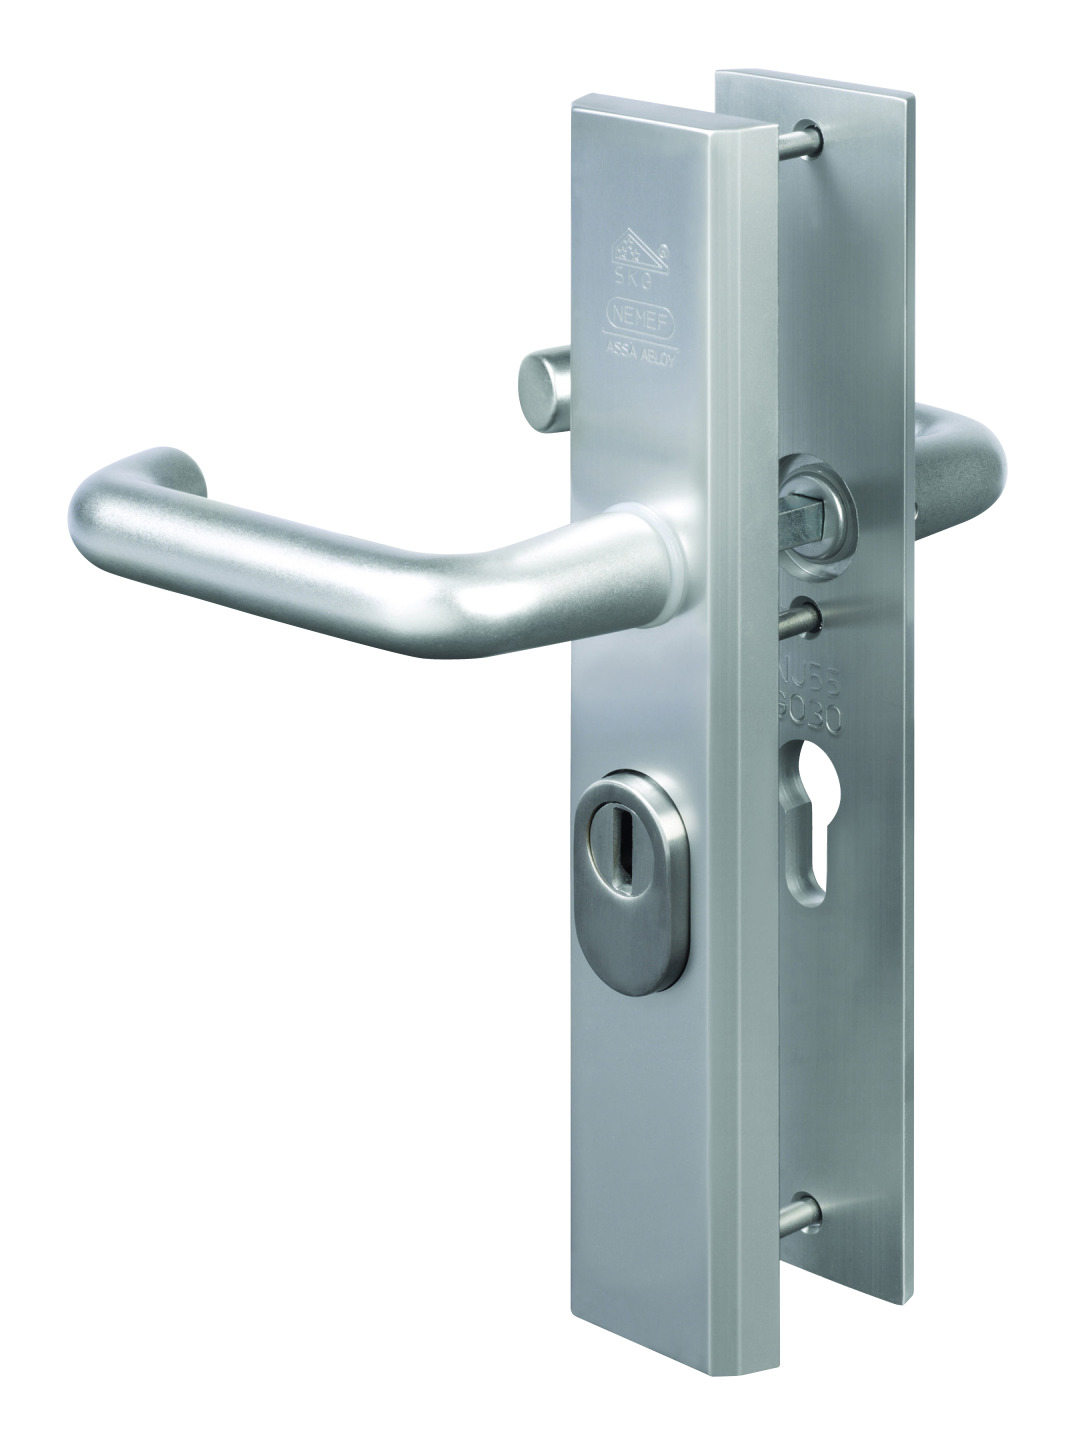 NEME deurbeslag (set) 3417, alu, (lxb) 245x50mm